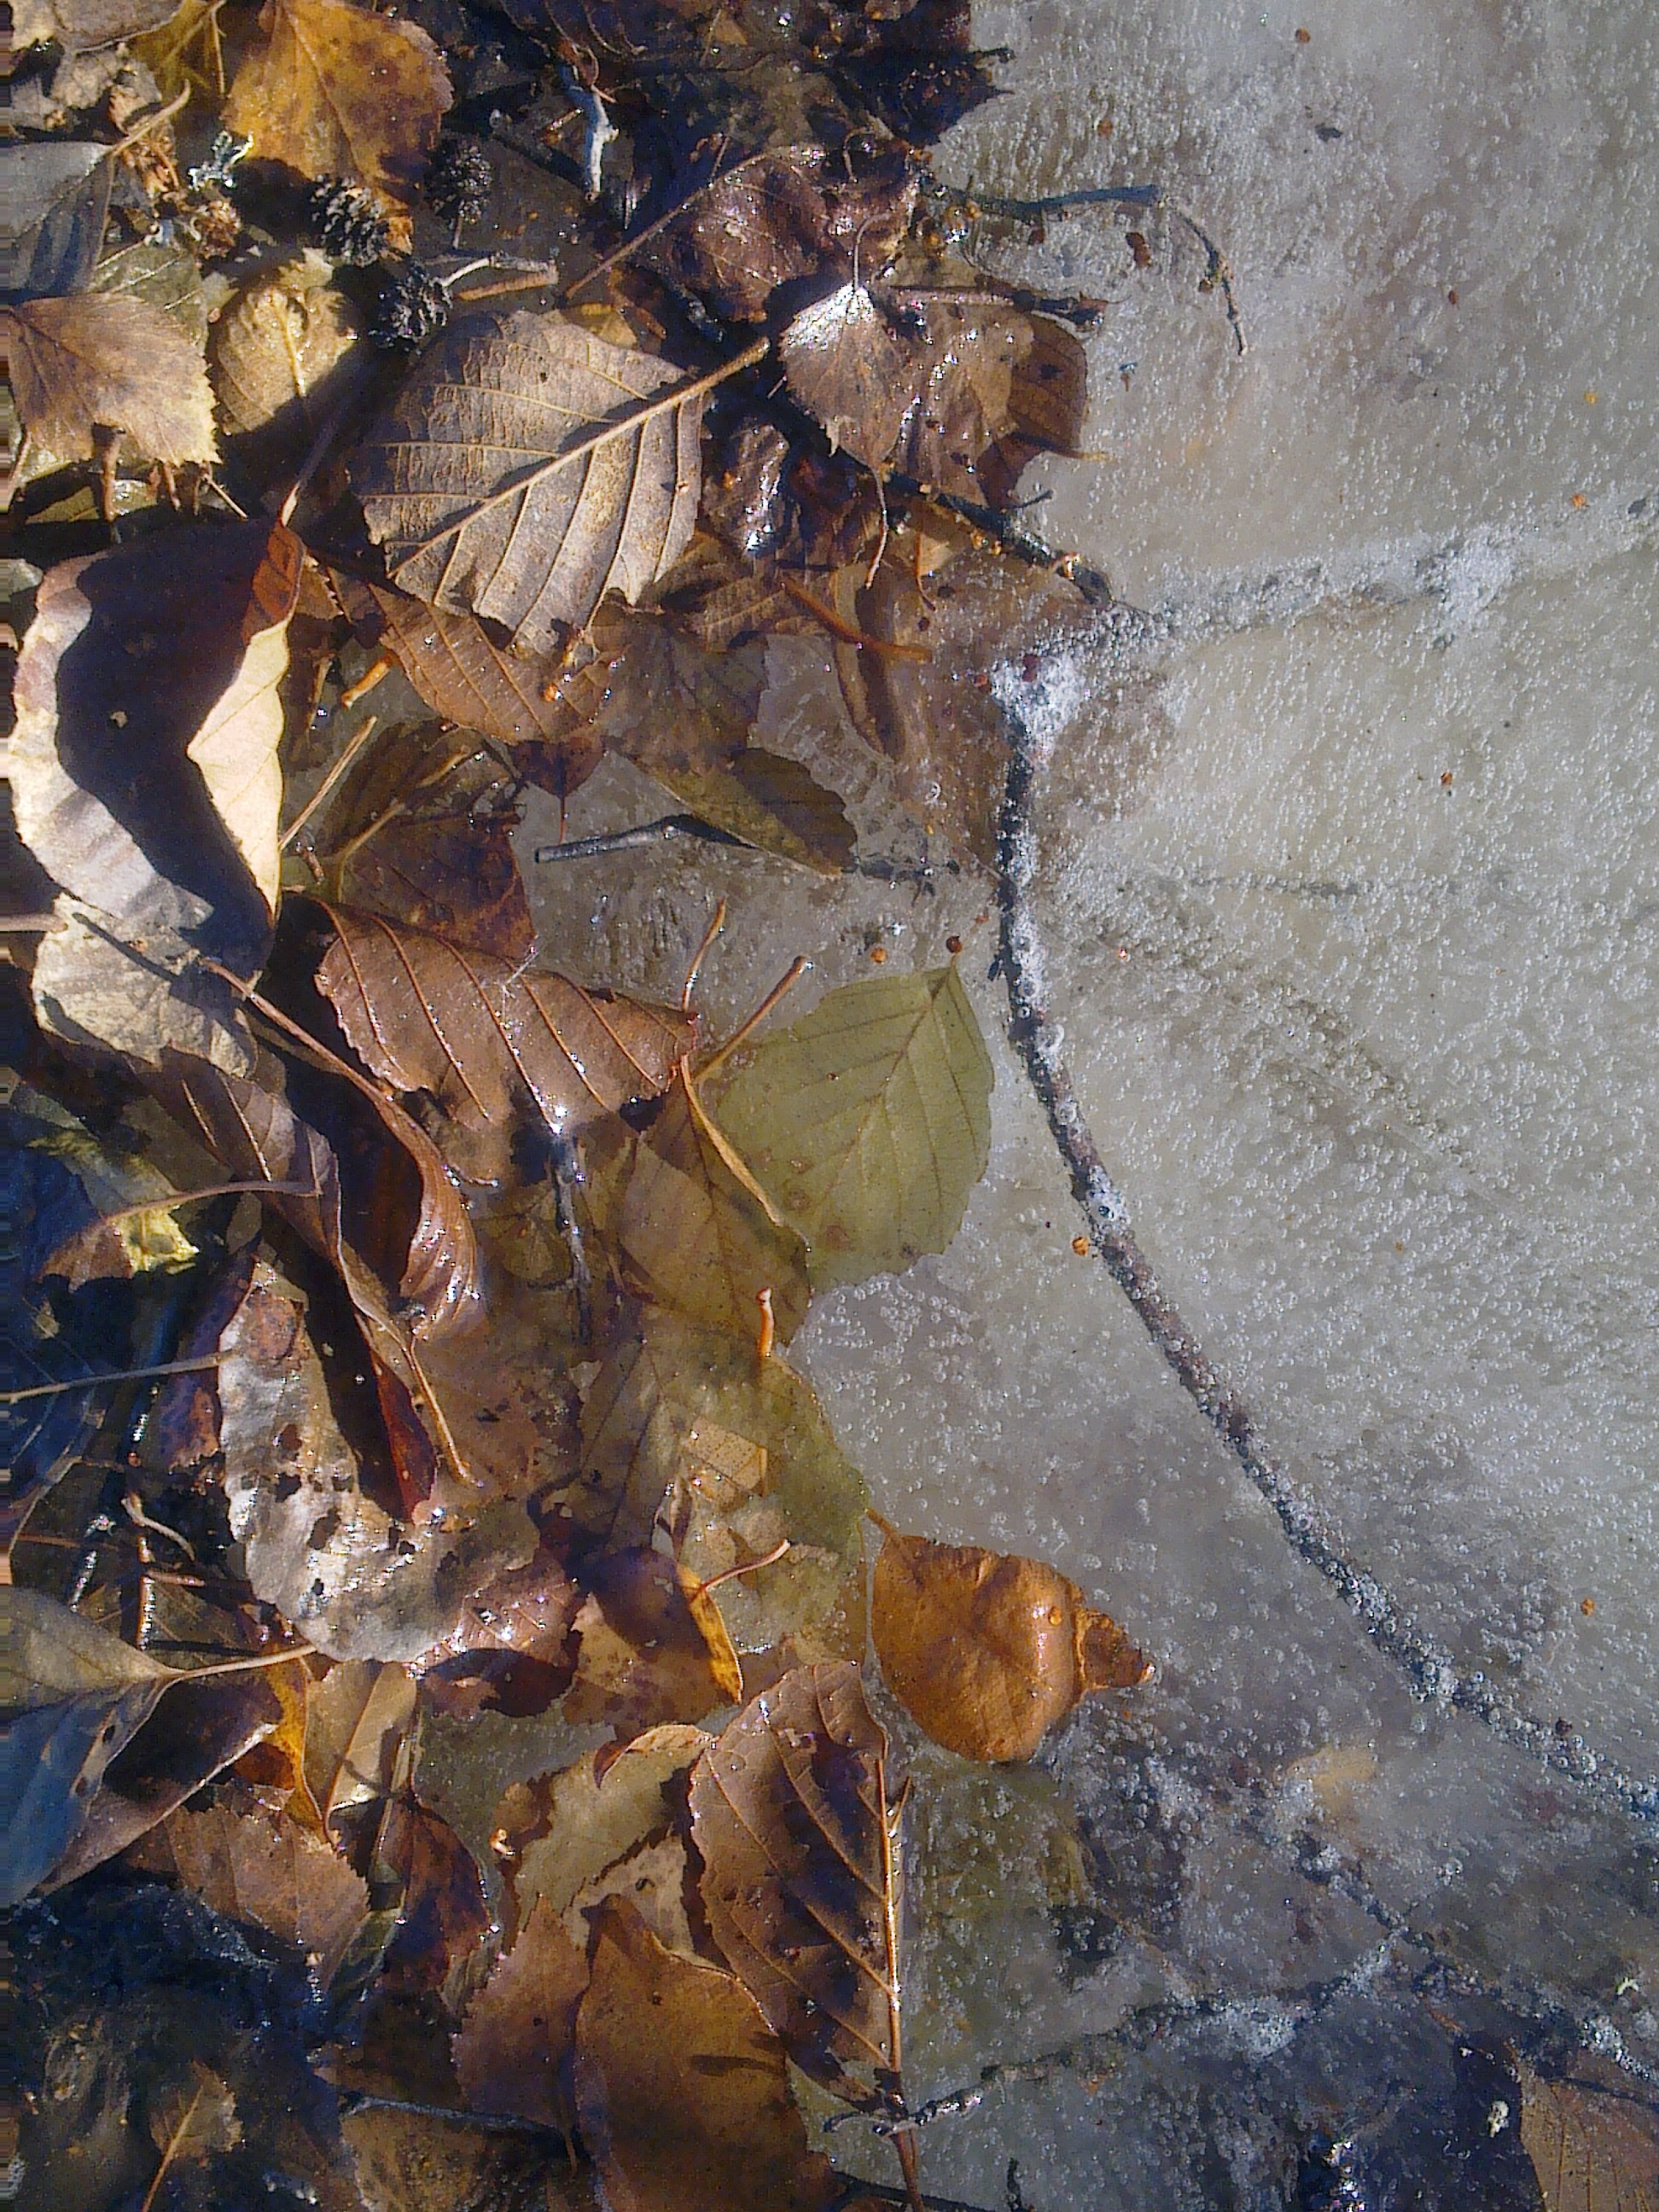 leaves-hugging-ice-3